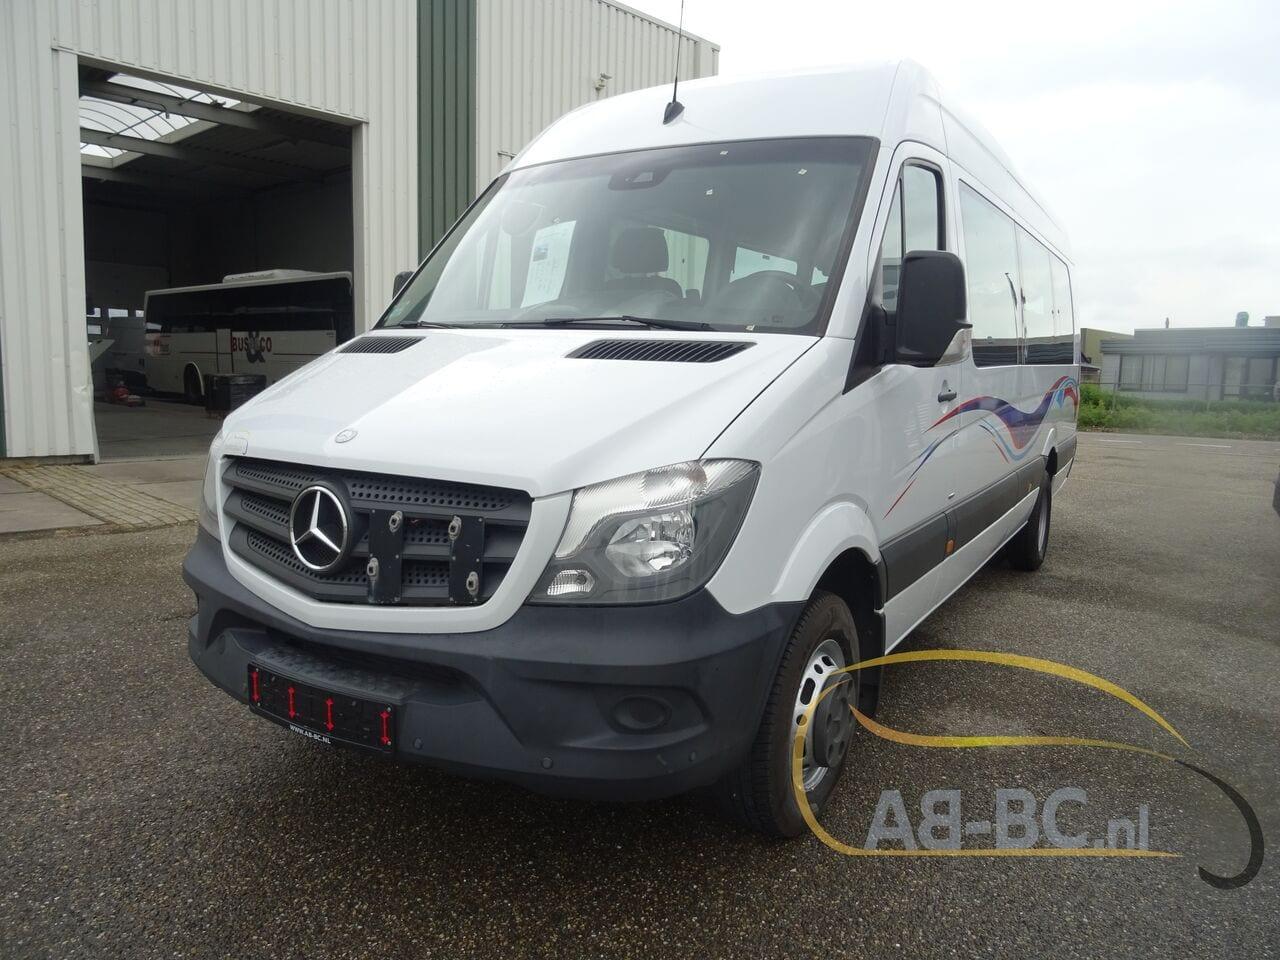 coach-busMERCEDES-BENZ-516-CDI-Sprinter-Transfer-45-23-Seats-EURO-6---1625493749532878582_big_8fa0f43efc35ce3378f5c9ac0a629a43--21060112394245379500